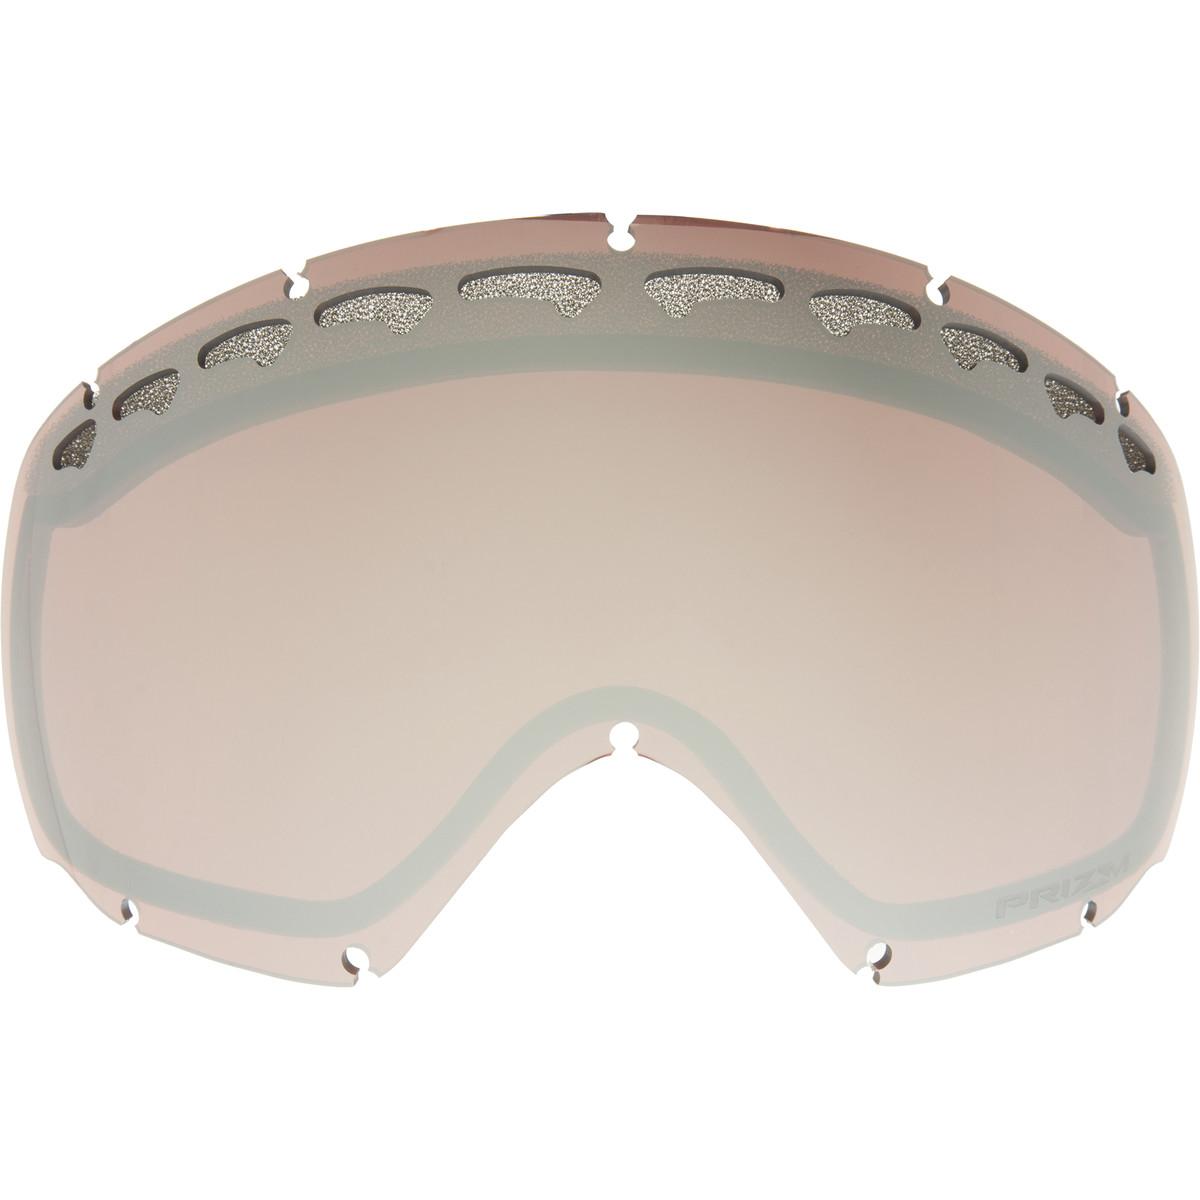 photo: Oakley Crowbar Snow Accessory Lens goggle lens